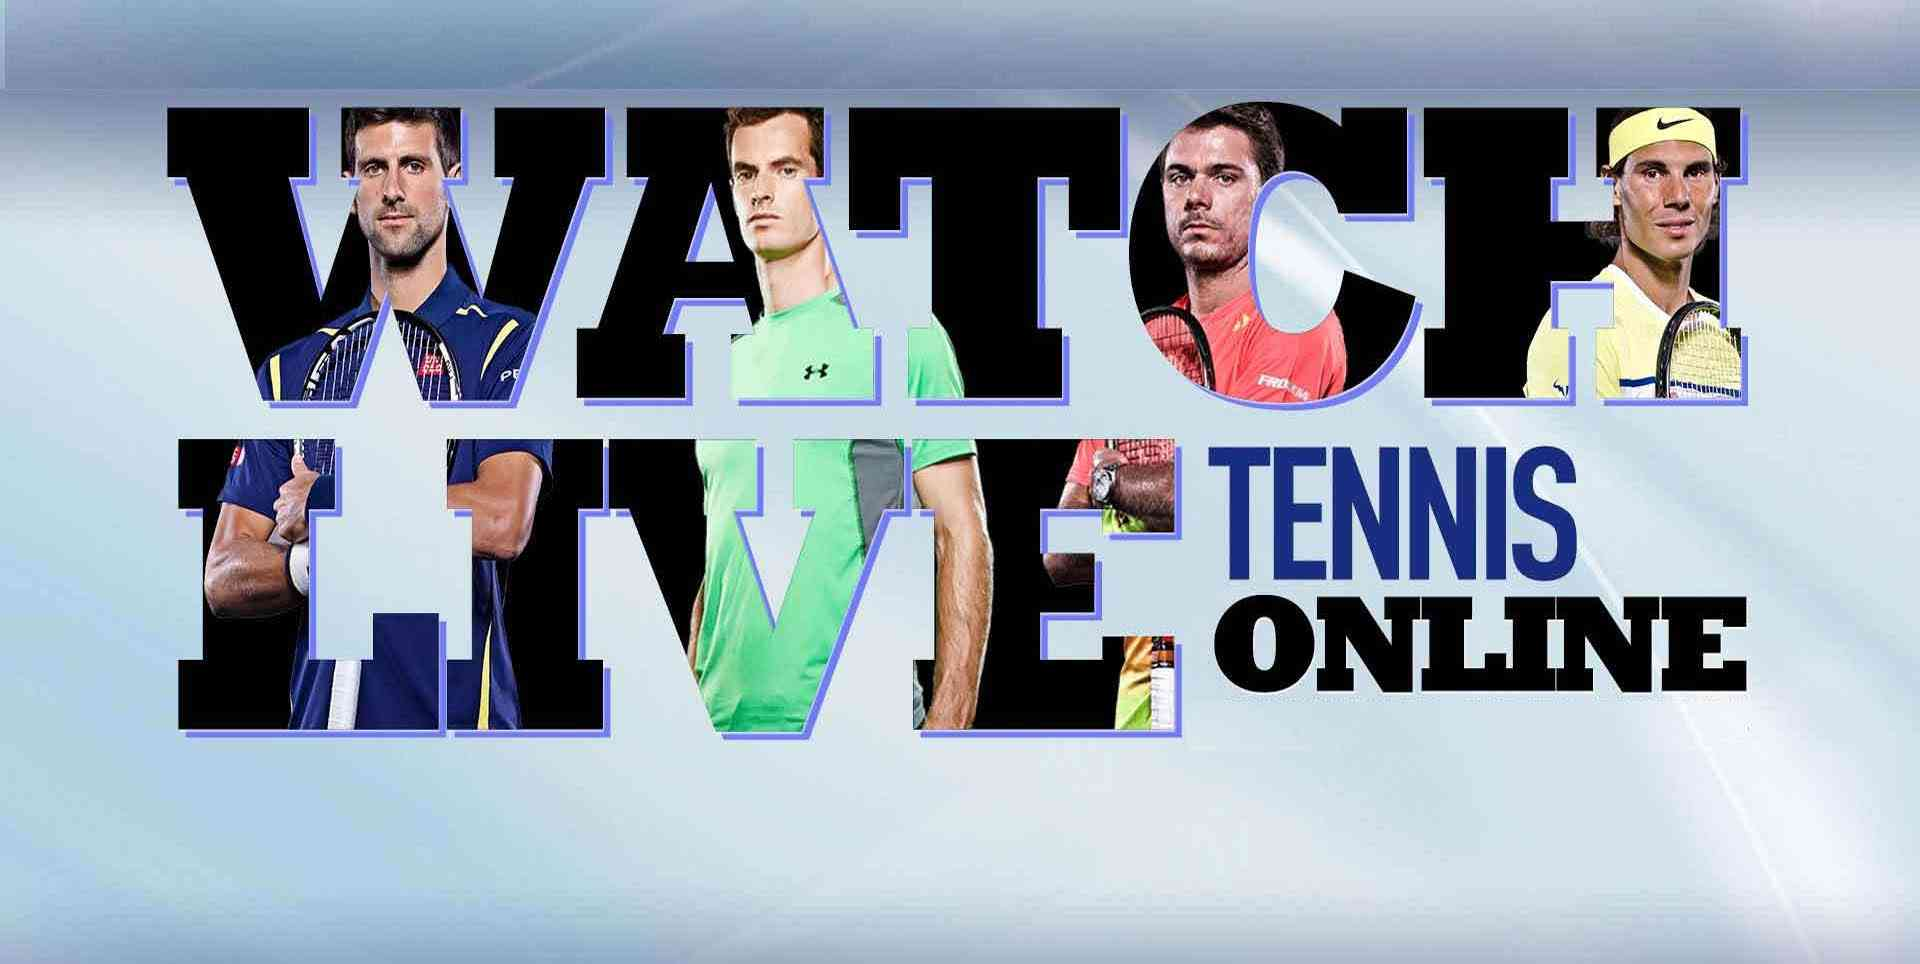 live-l.-rosol-vs-p.-kohlschreiber-quarterfinals-online